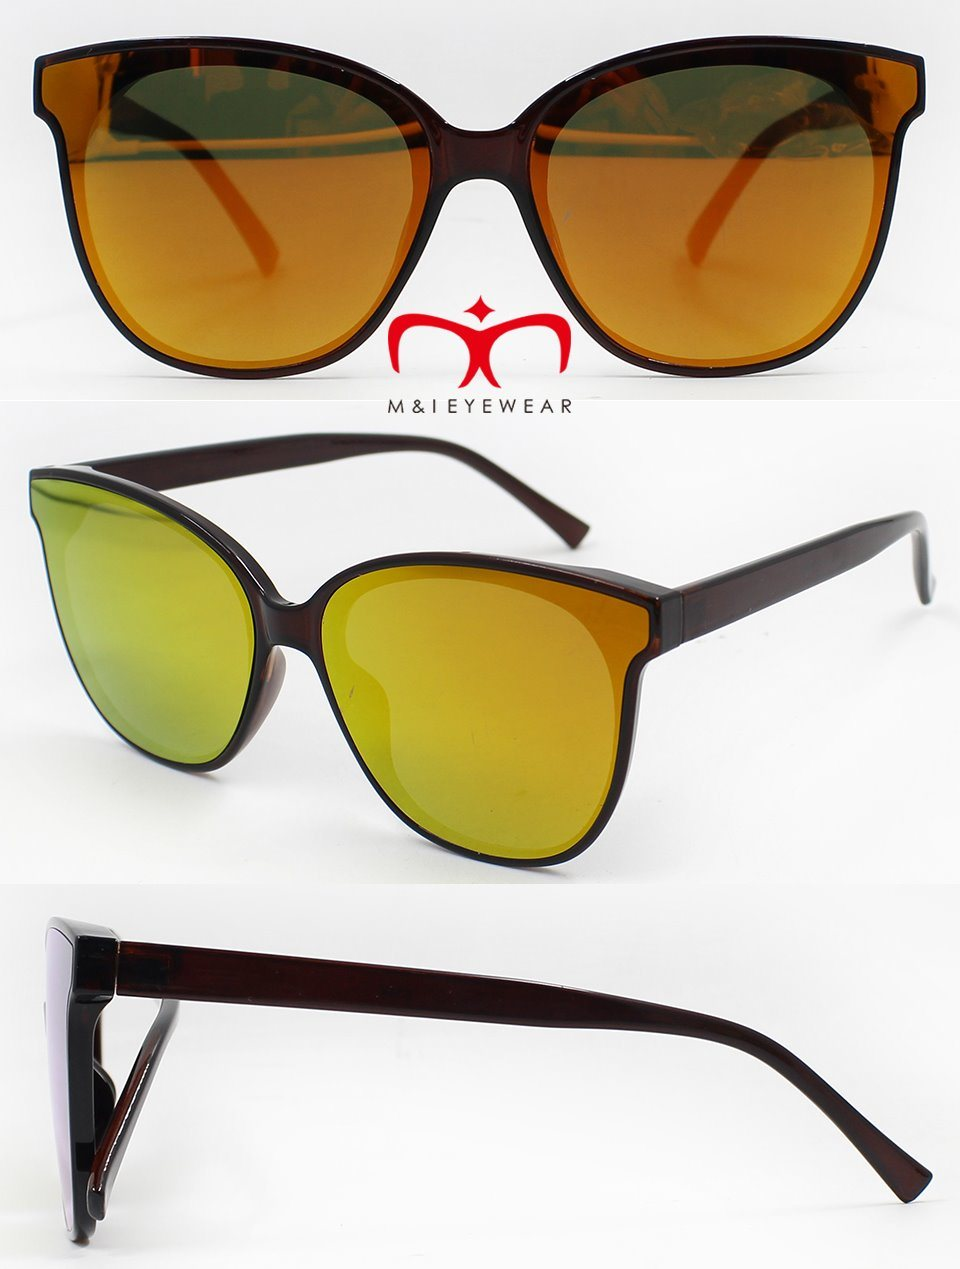 88a8f27ff80 New Sunglasses 2018 – Fashion dresses